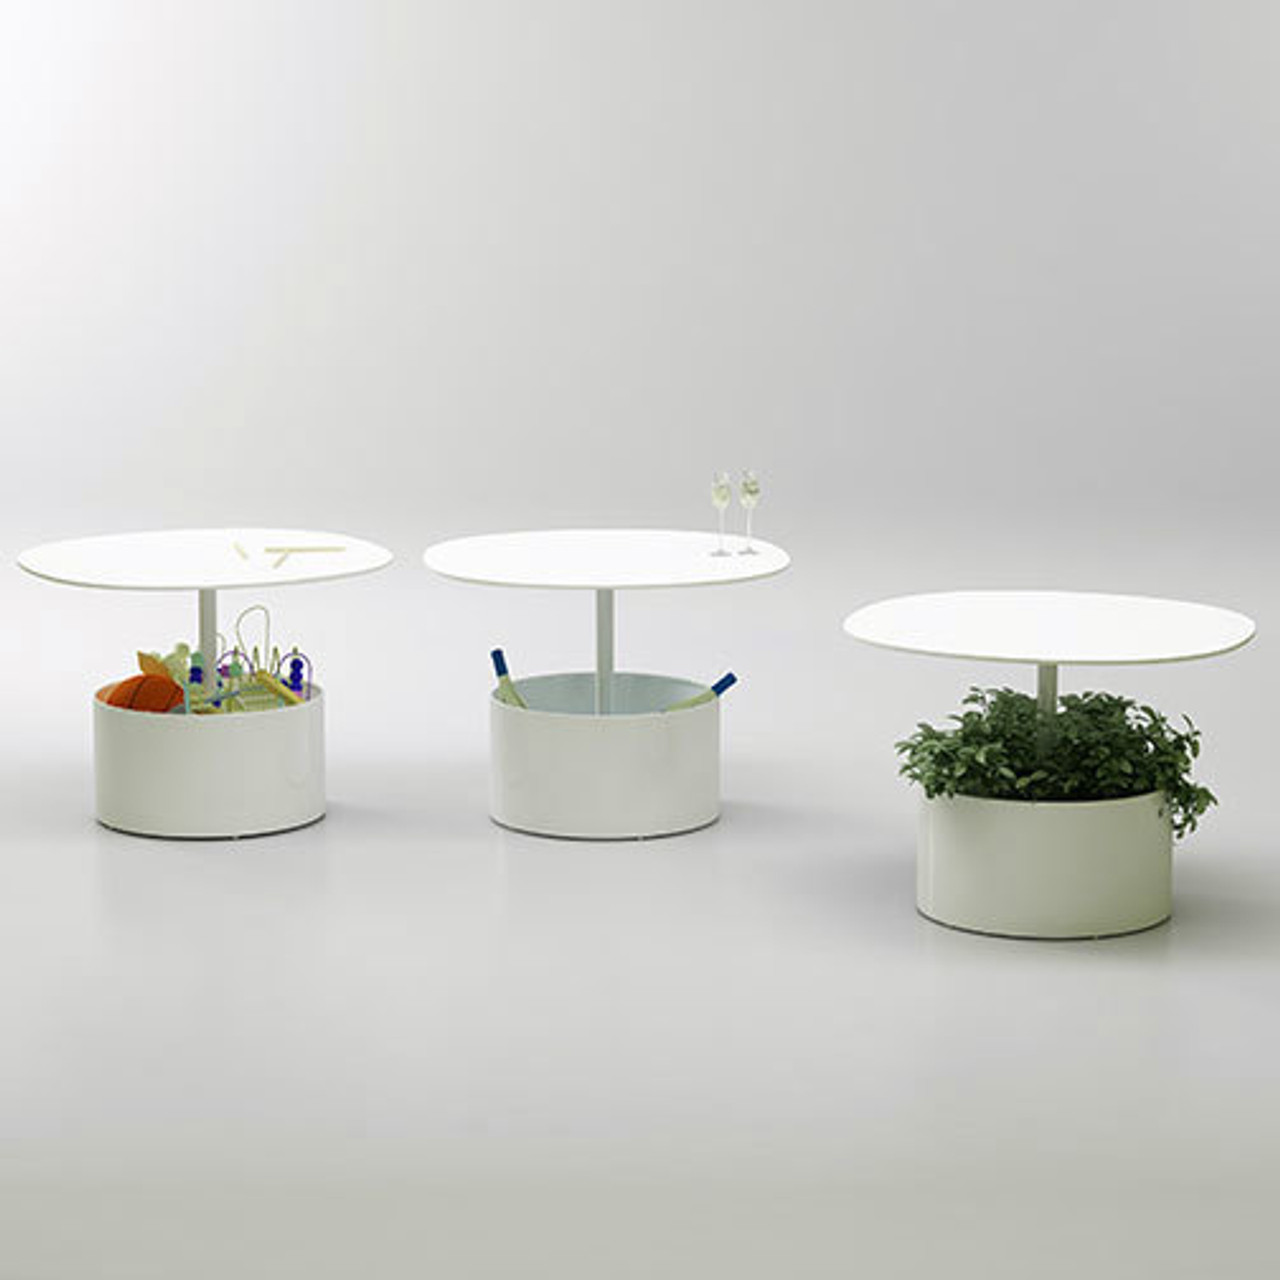 Magnuson Laura Planter Tables